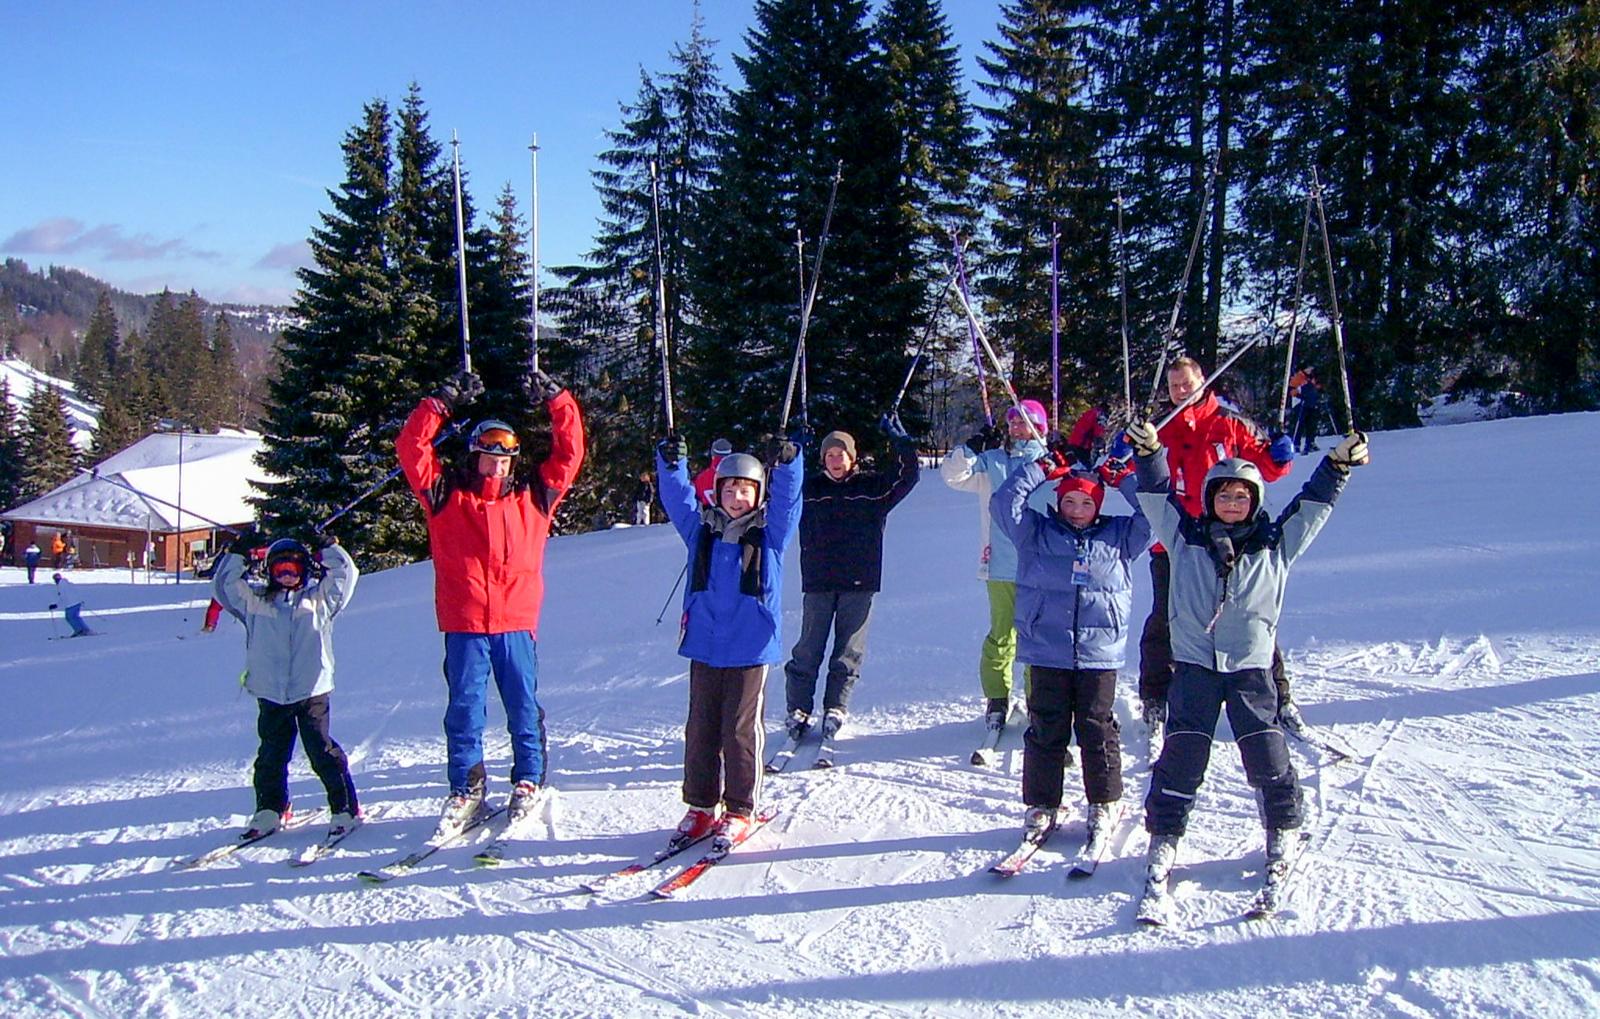 1-taegiger-skikurs-am-feldberg-bg2